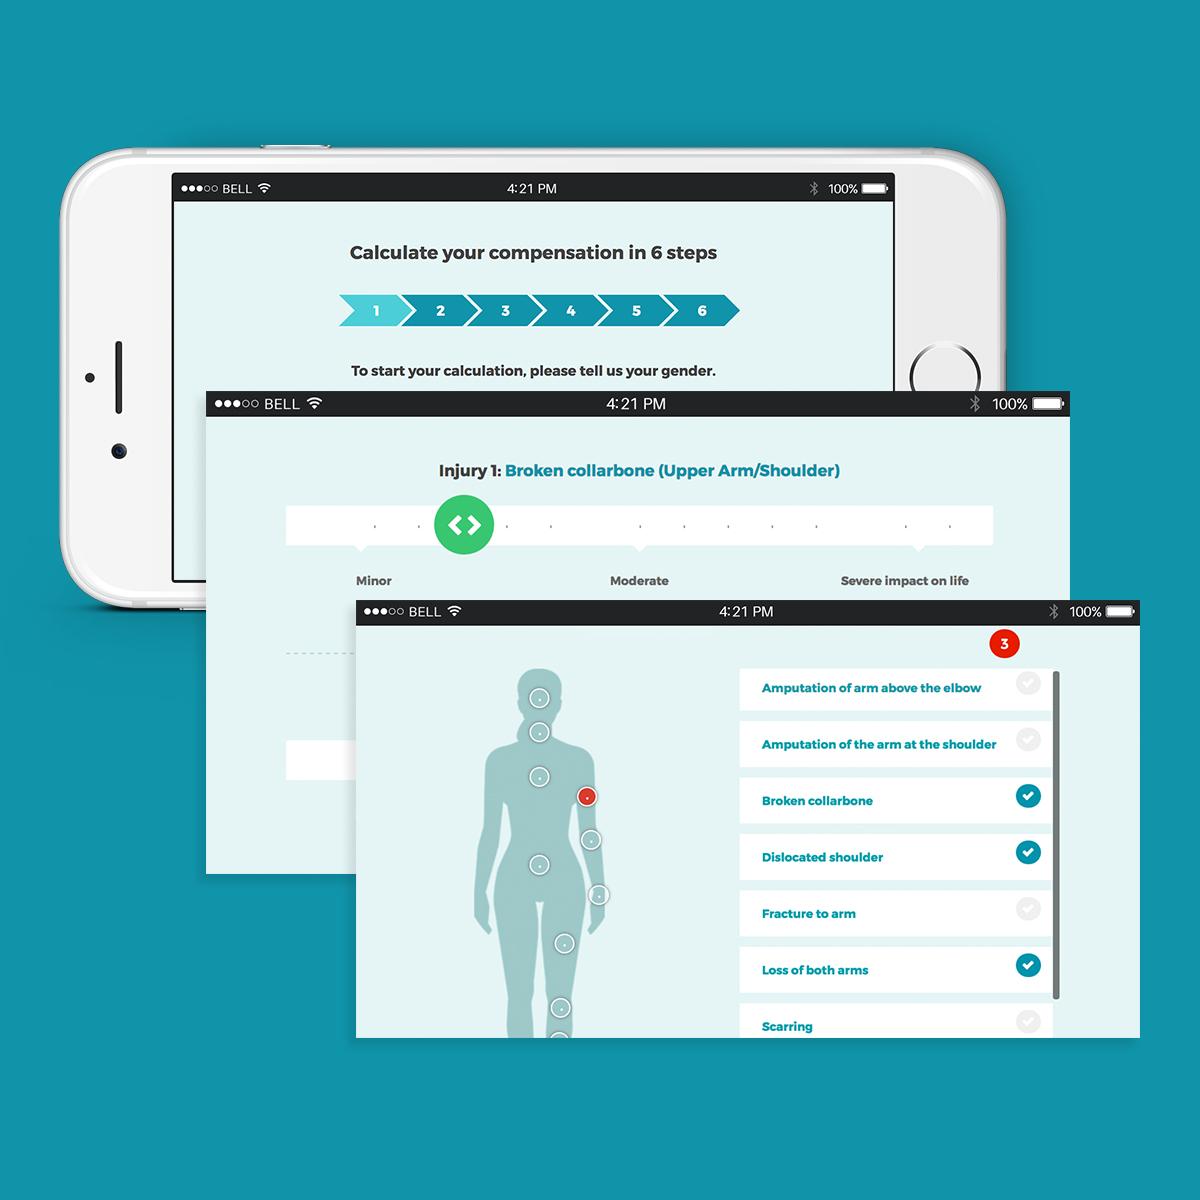 Web App: National Accident Helpline